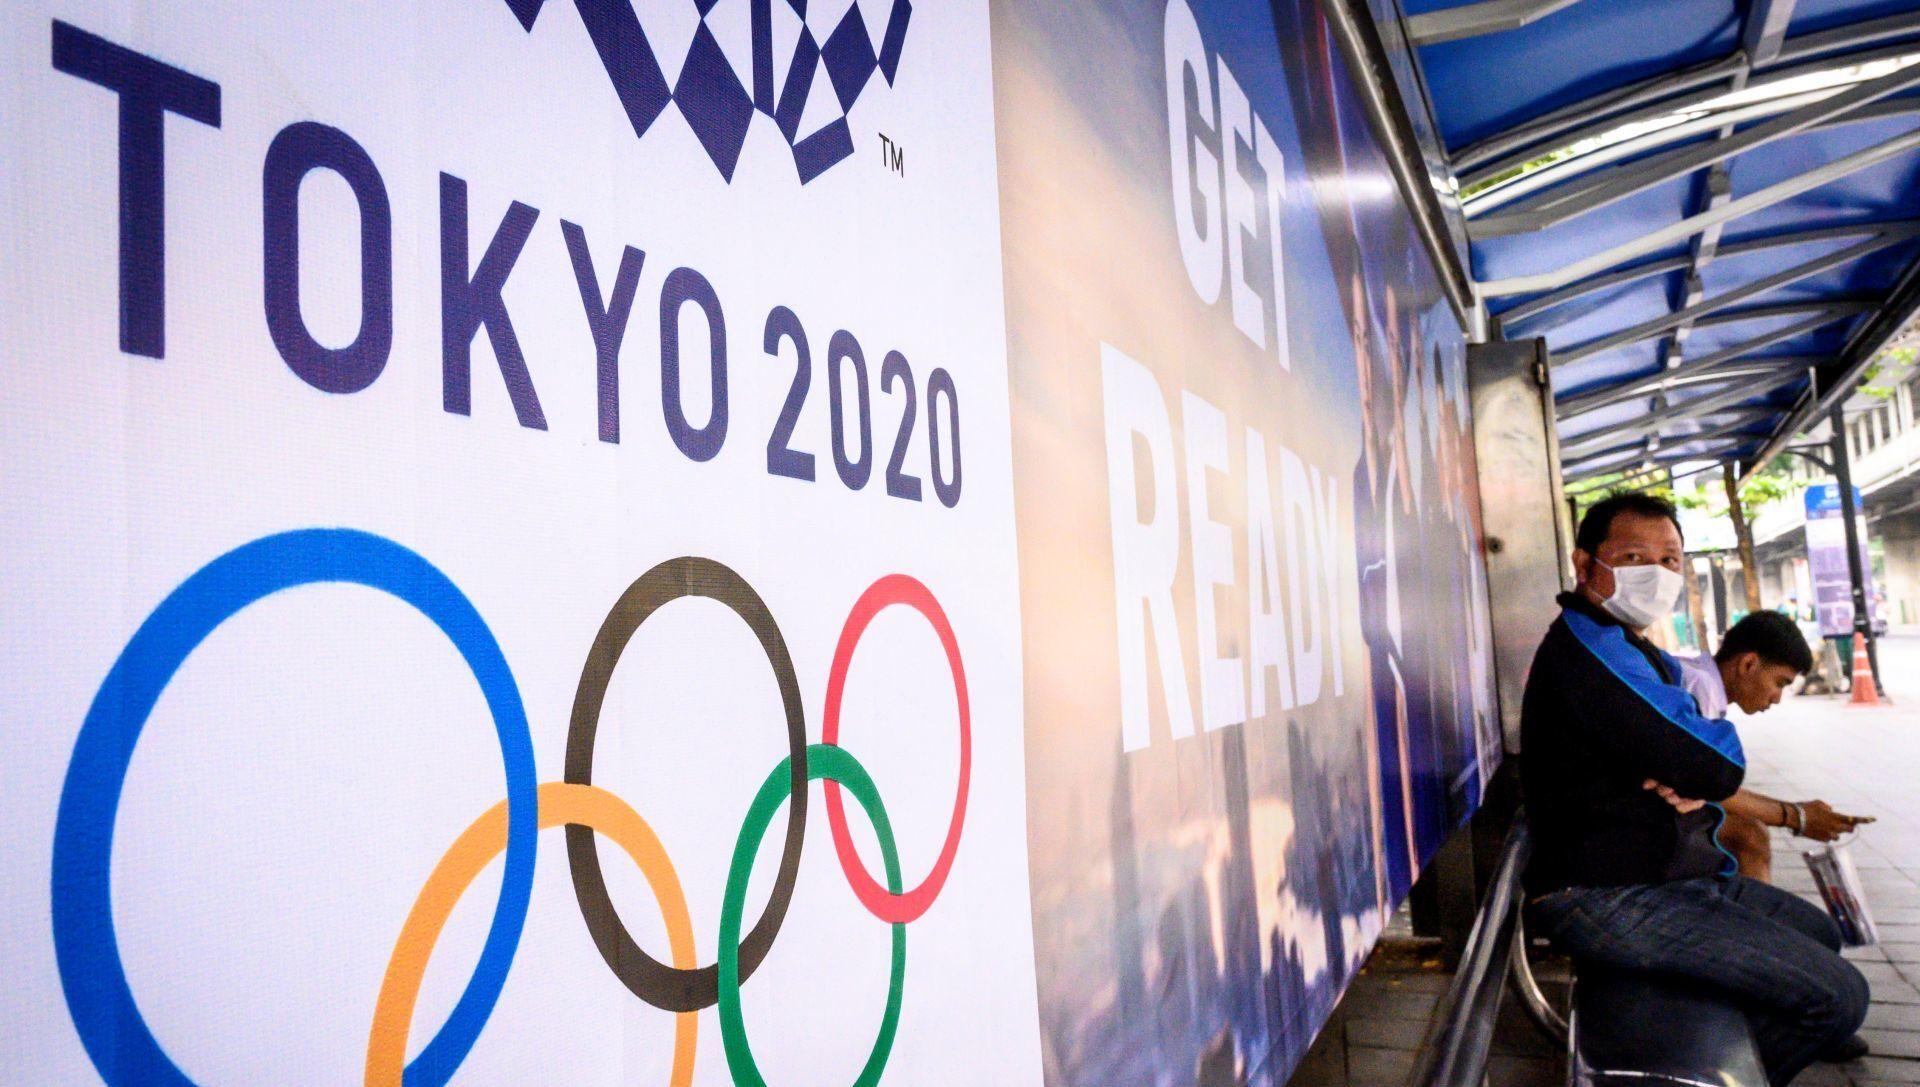 Логотип Олимпийских игр в Токио-2020, фото из архива - Sputnik Азербайджан, 1920, 28.04.2021